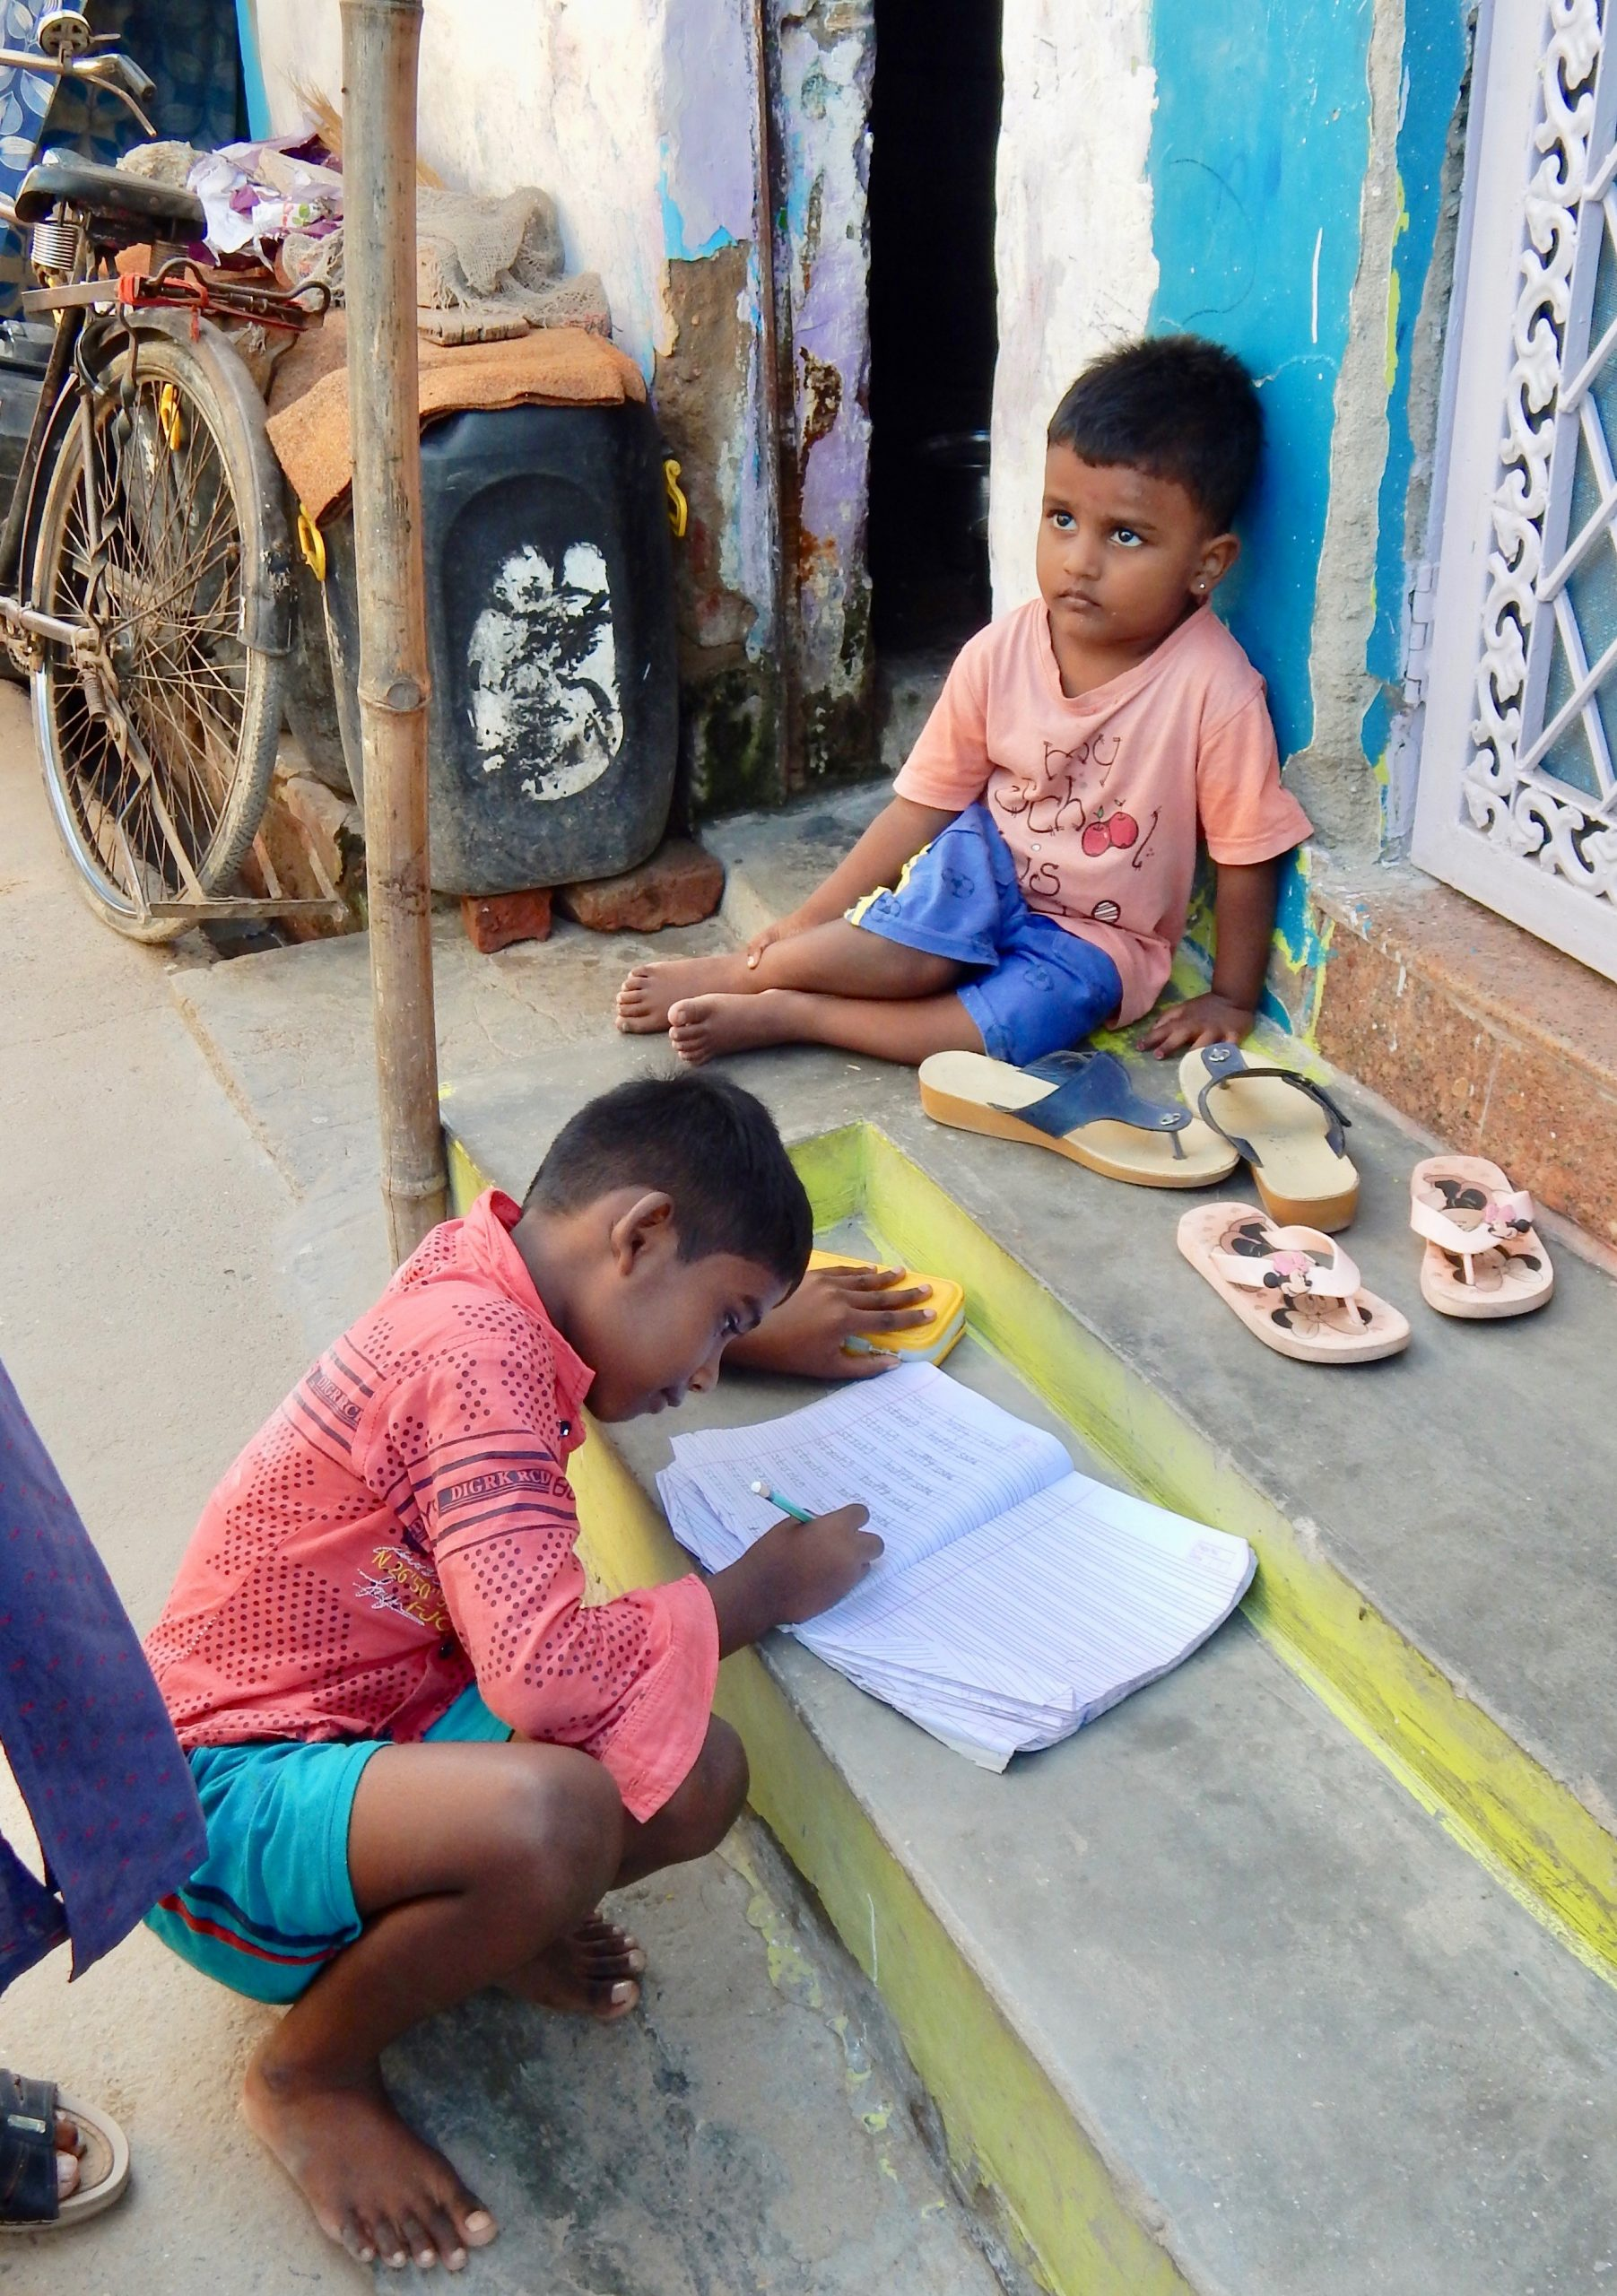 Two children in New Delhi slum community 2019